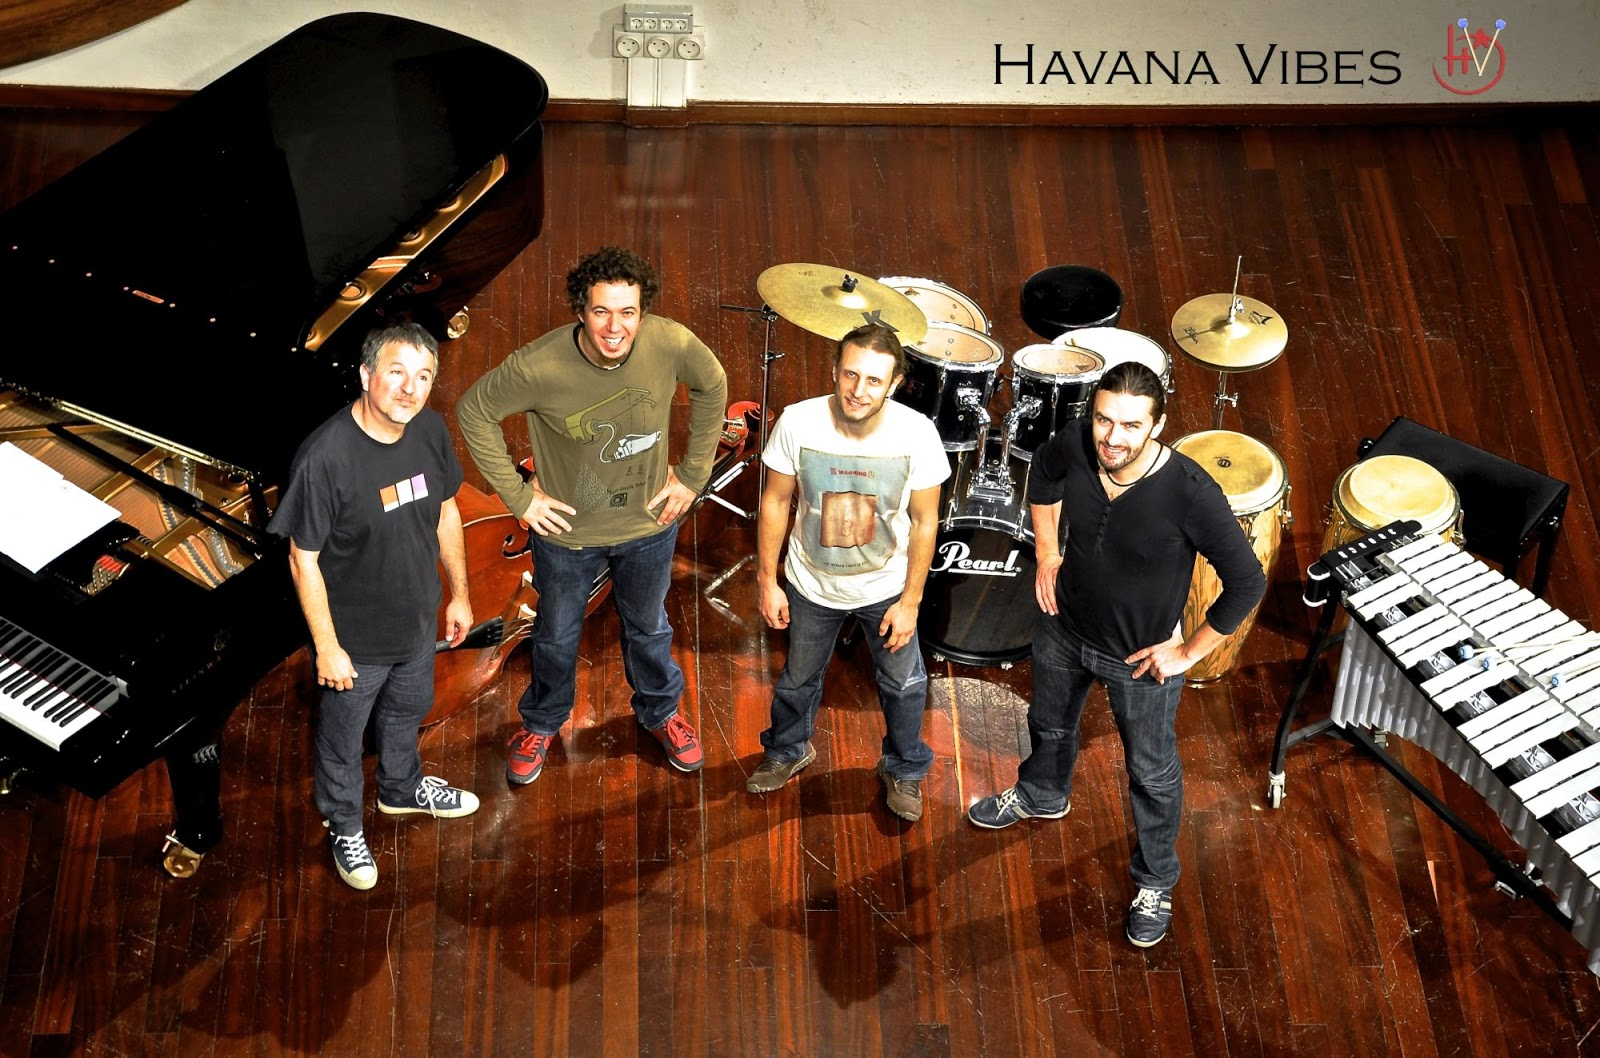 Turno para Havana Vibes en Naturajazz